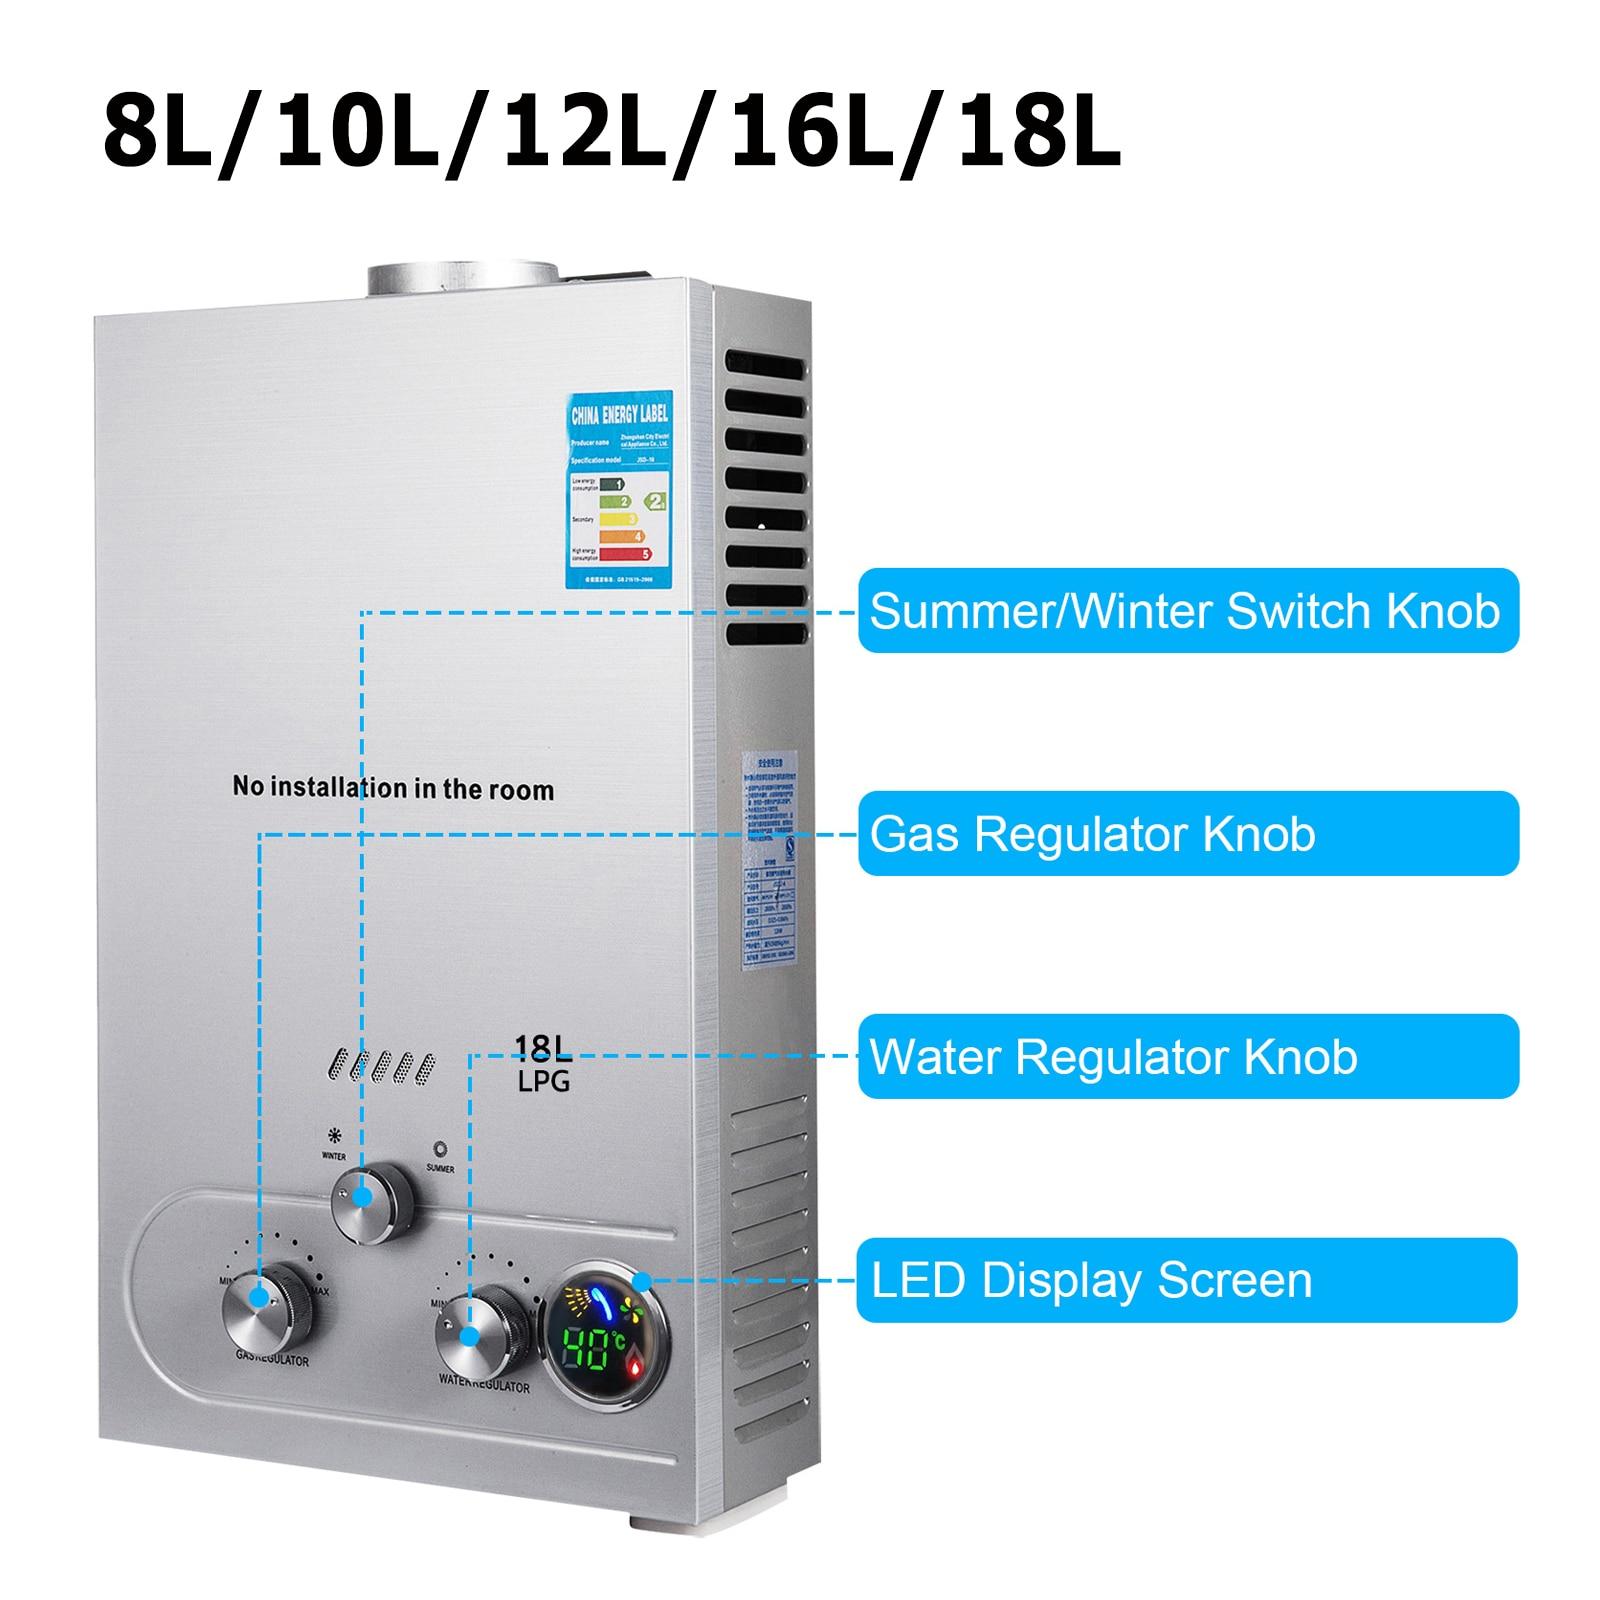 LPG Water Heater 6L/8L/10L/12L/16L/18L 36KW Instant Liquefied Petroleum Gas Water Heater Stainless S